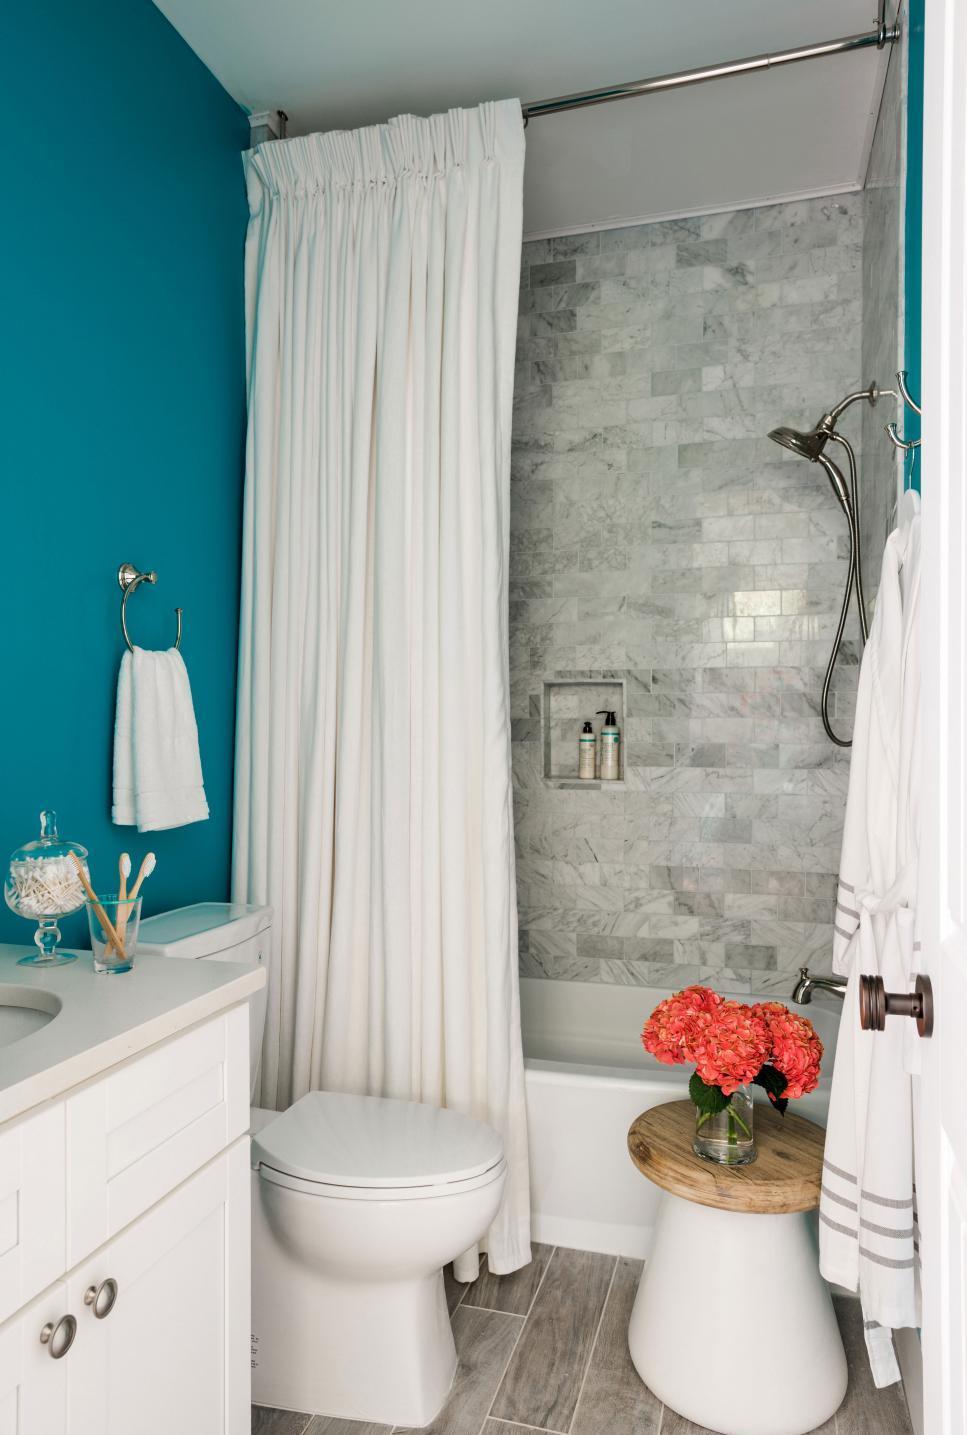 Маленькая ванная комната с мраморной плиткой